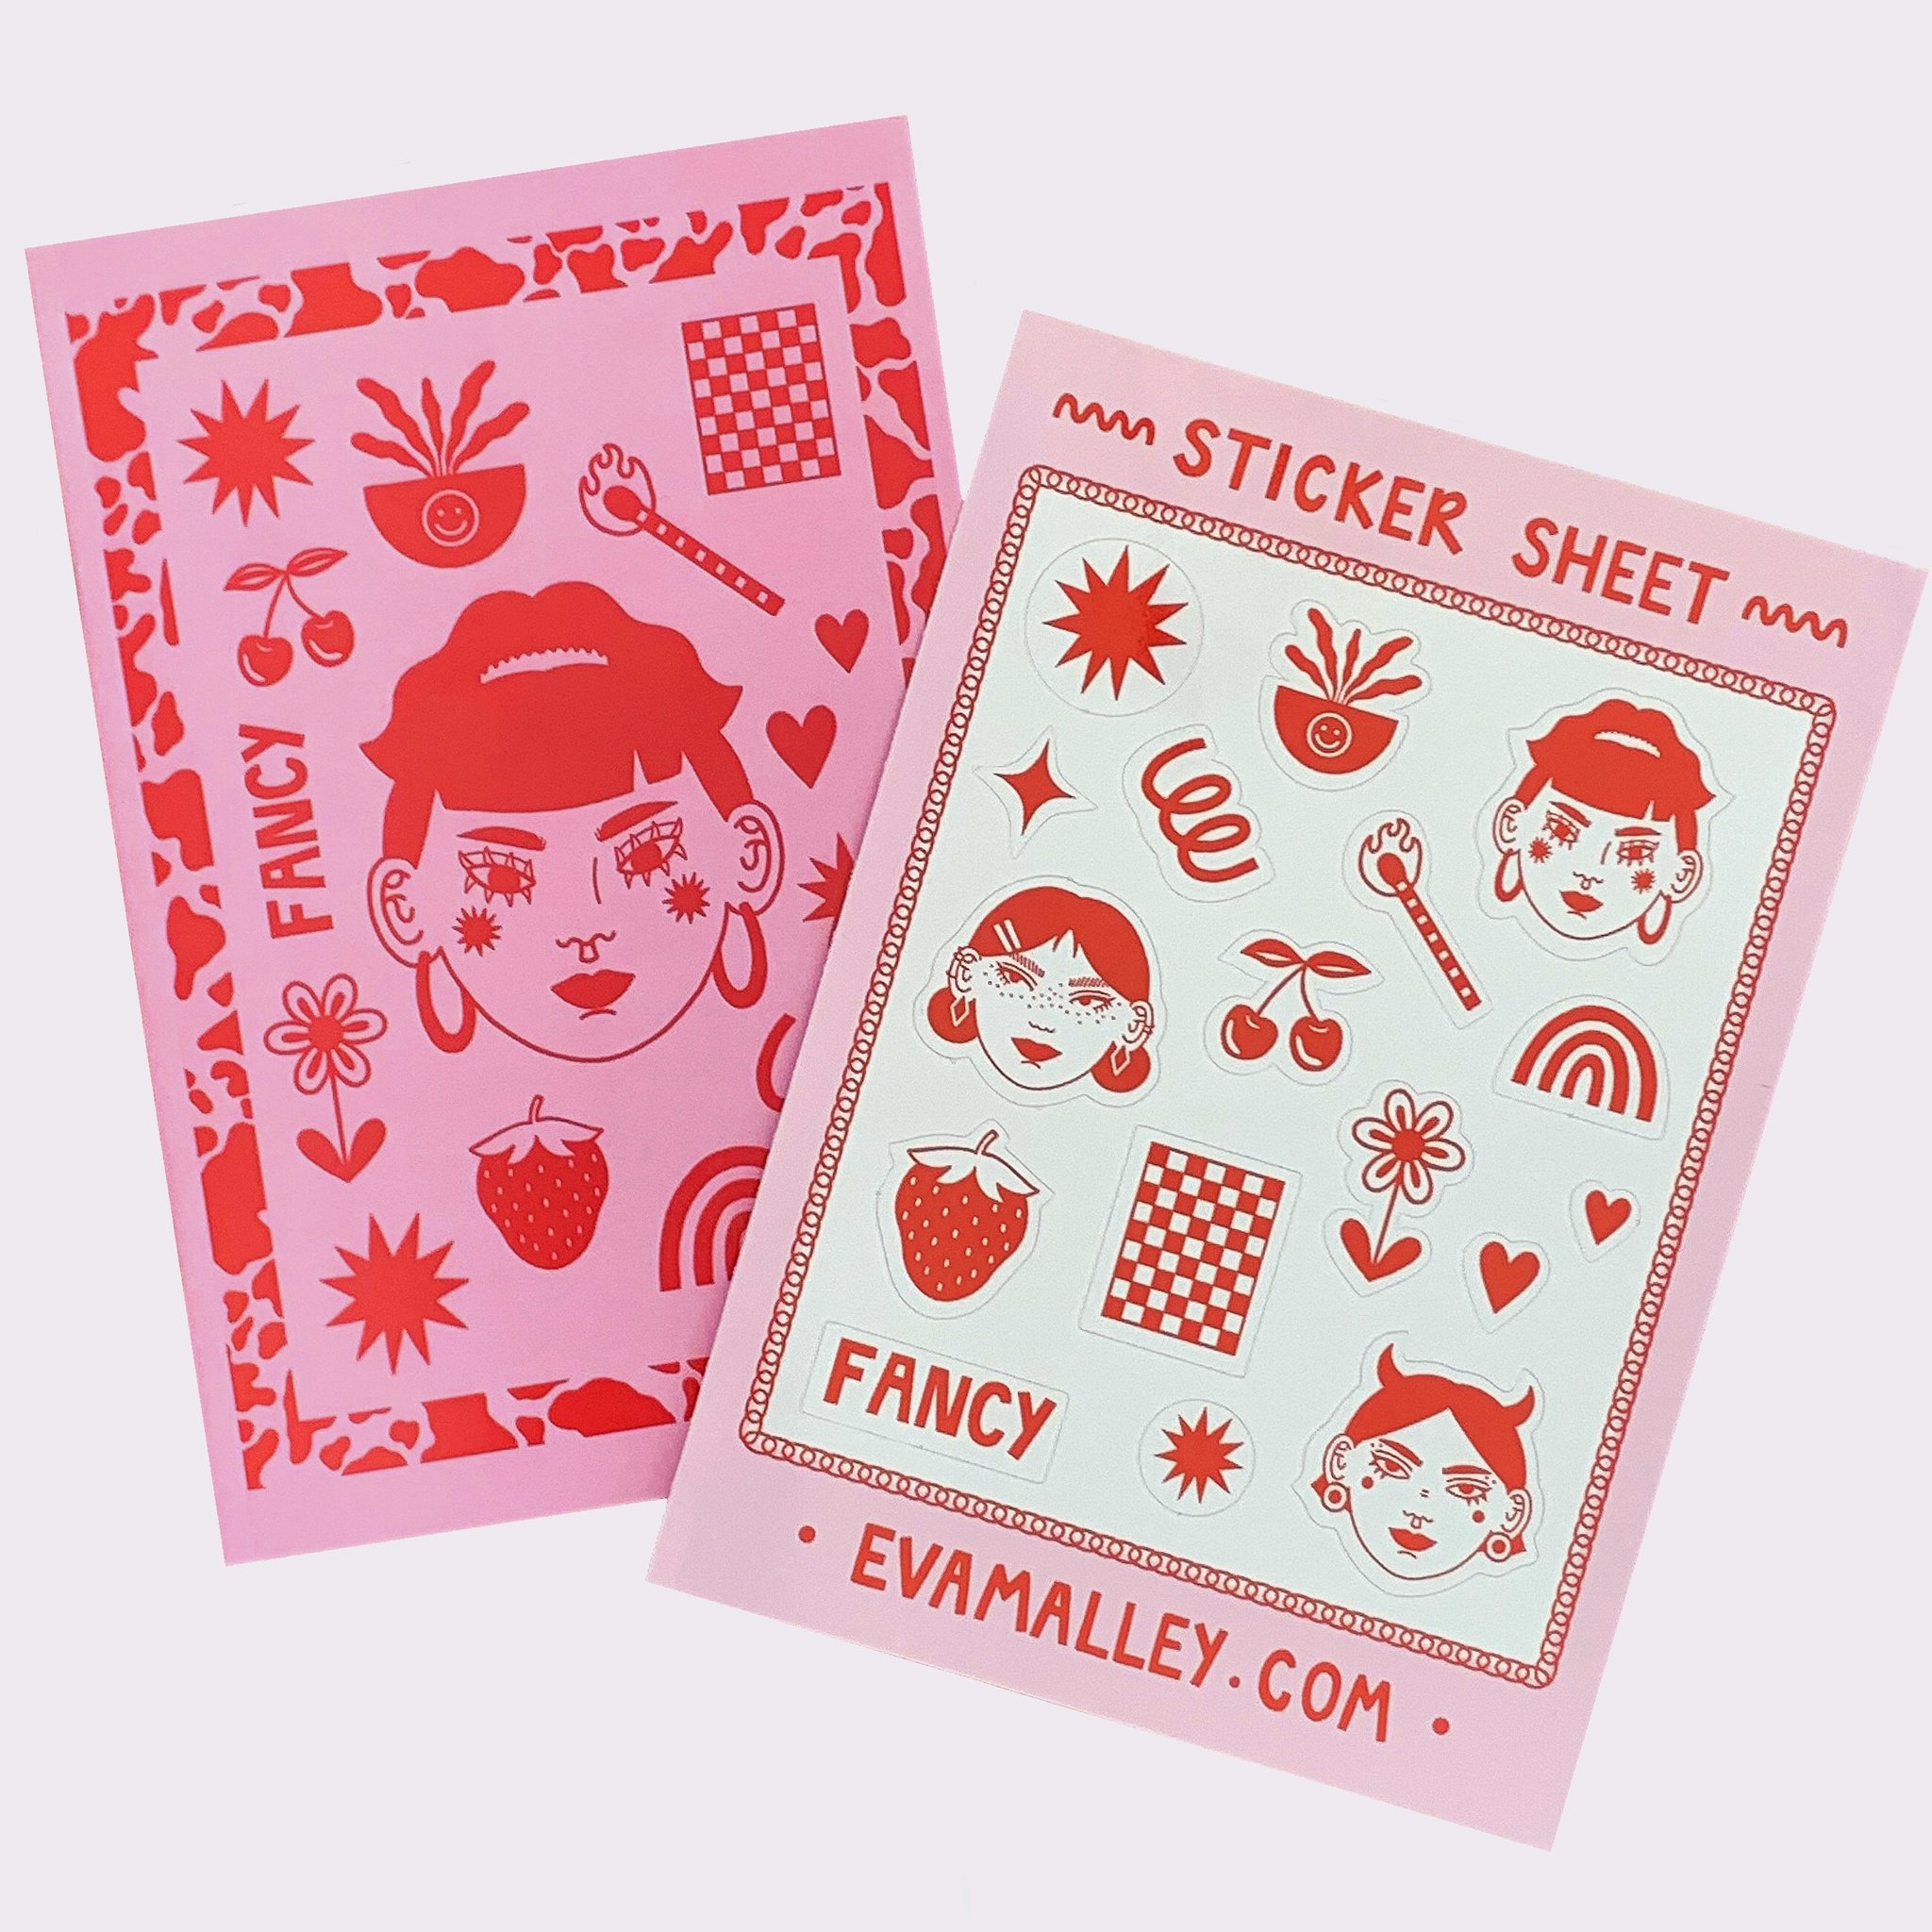 Eva Malley Illustration - Fancy Notebook & Sticker Set